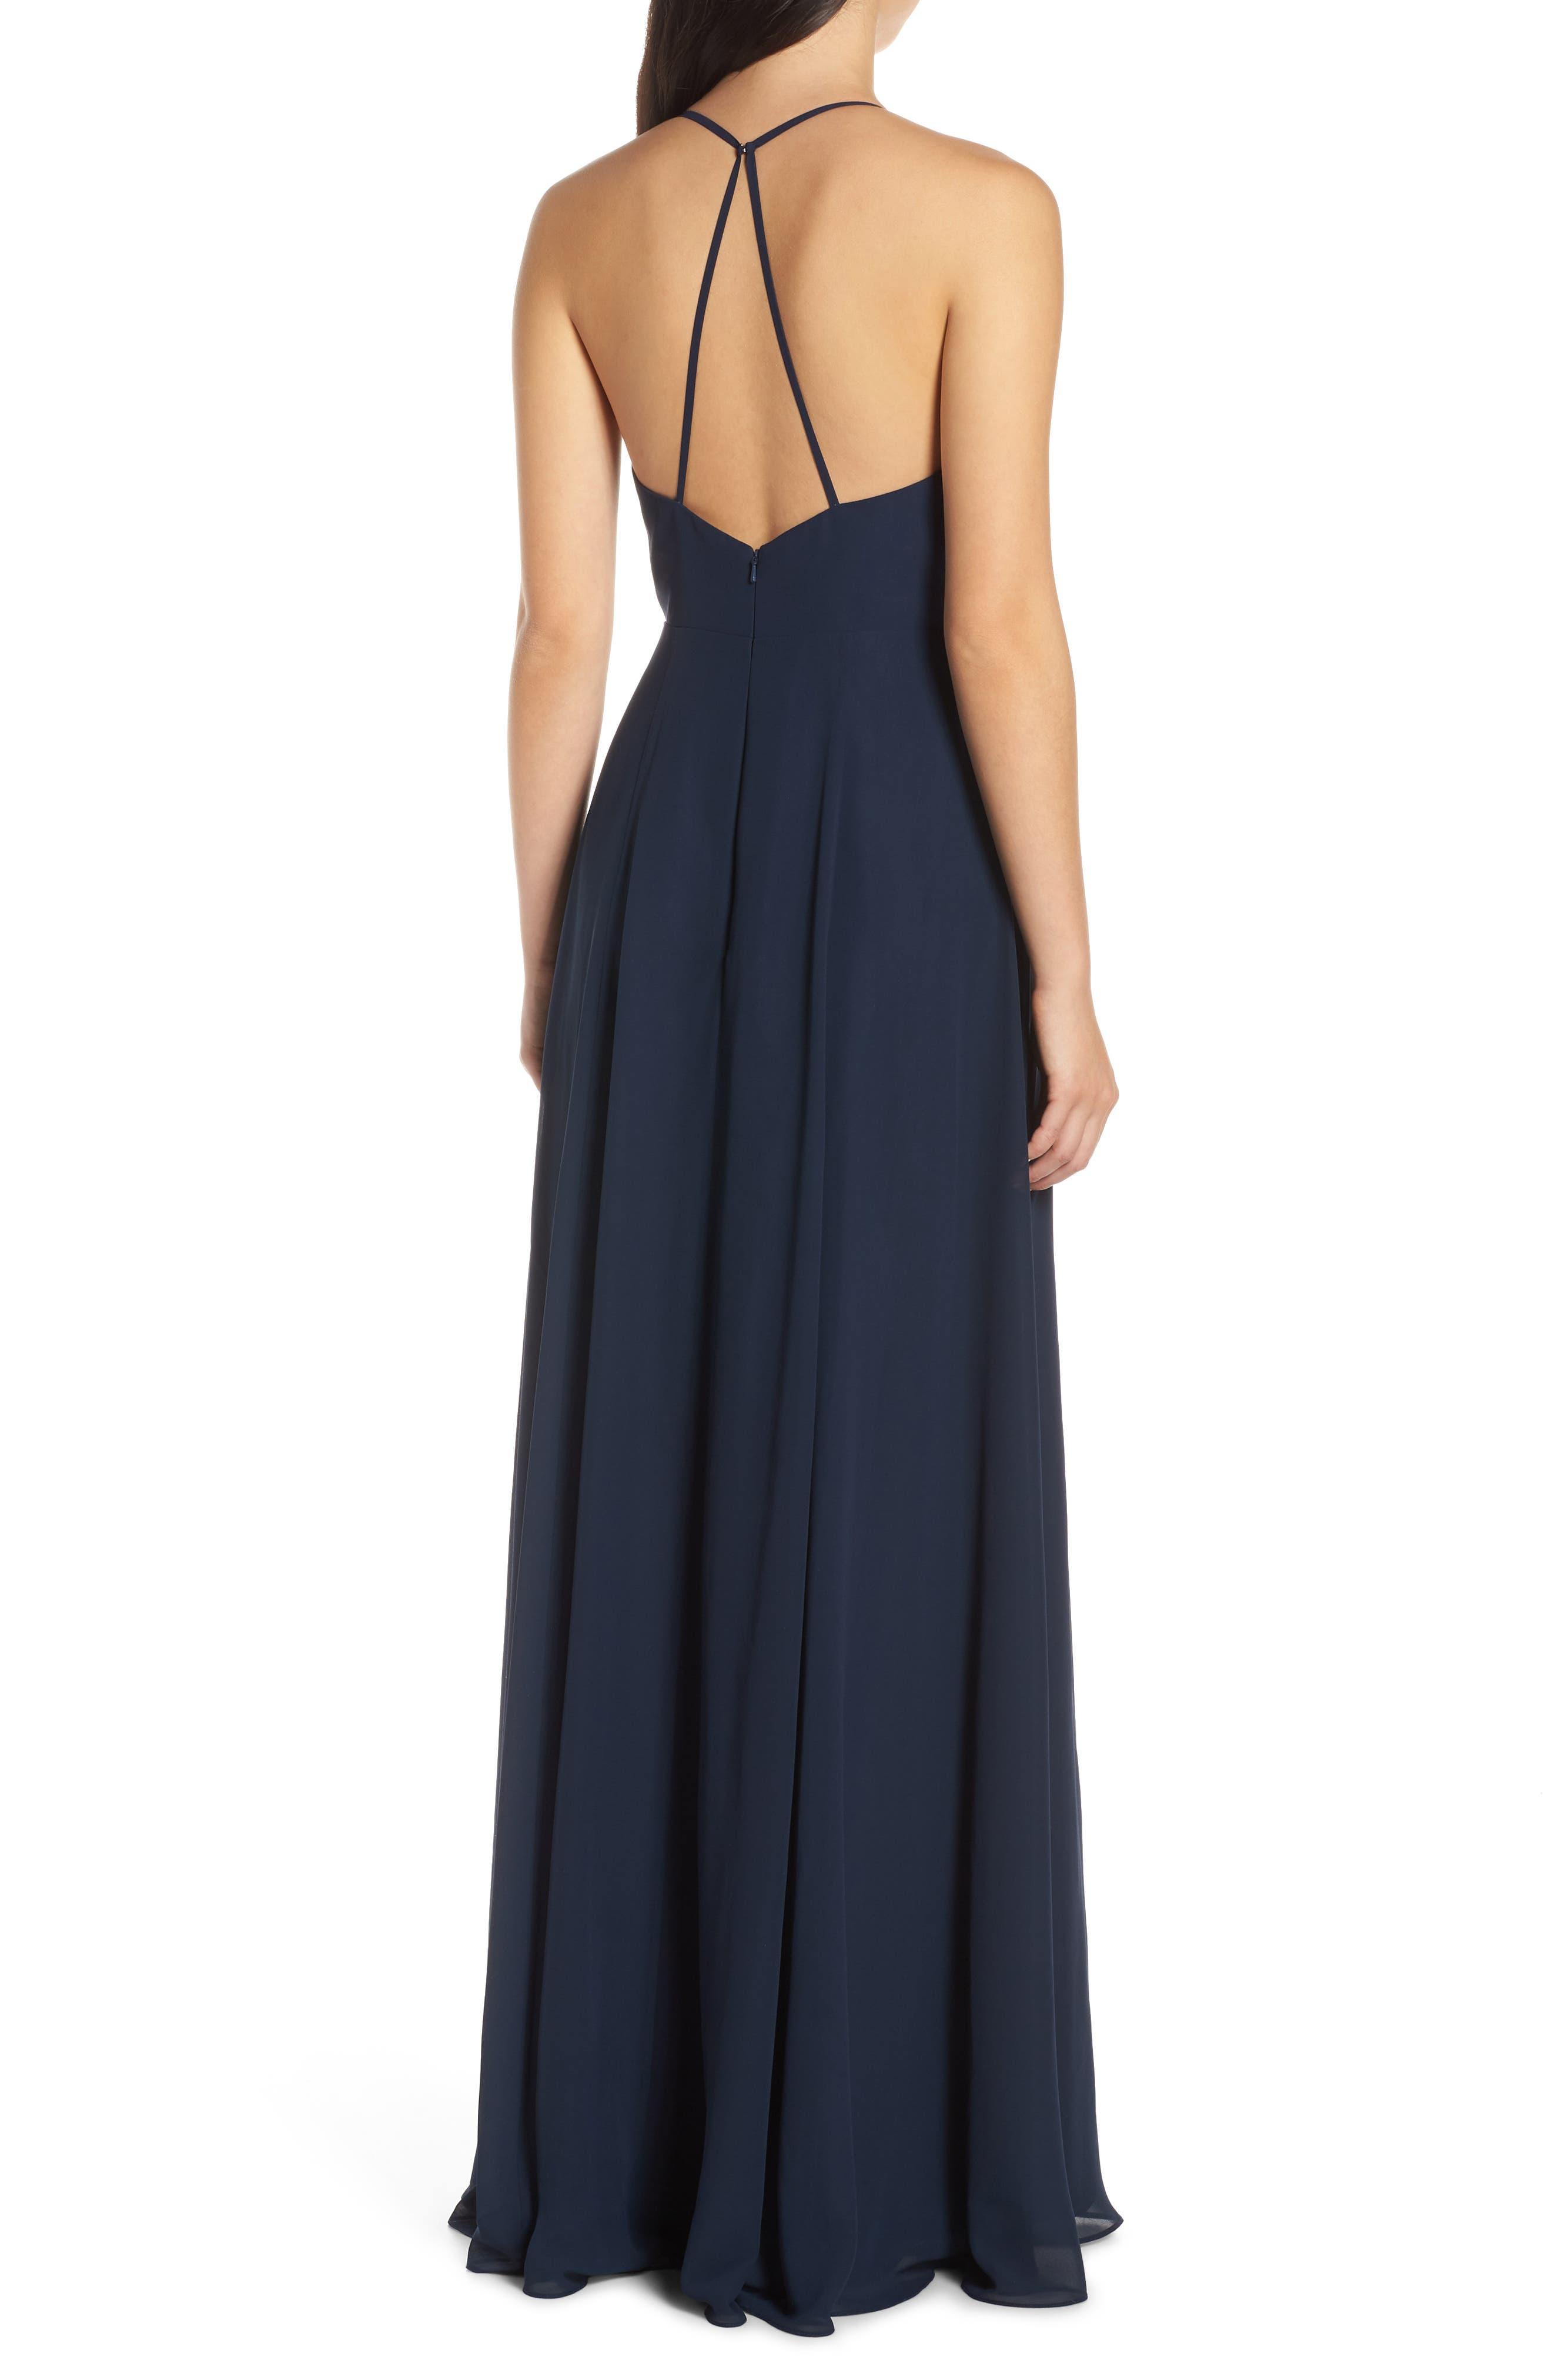 JENNY YOO, Bryce Surplice V-Neck Chiffon Evening Dress, Alternate thumbnail 2, color, NAVY